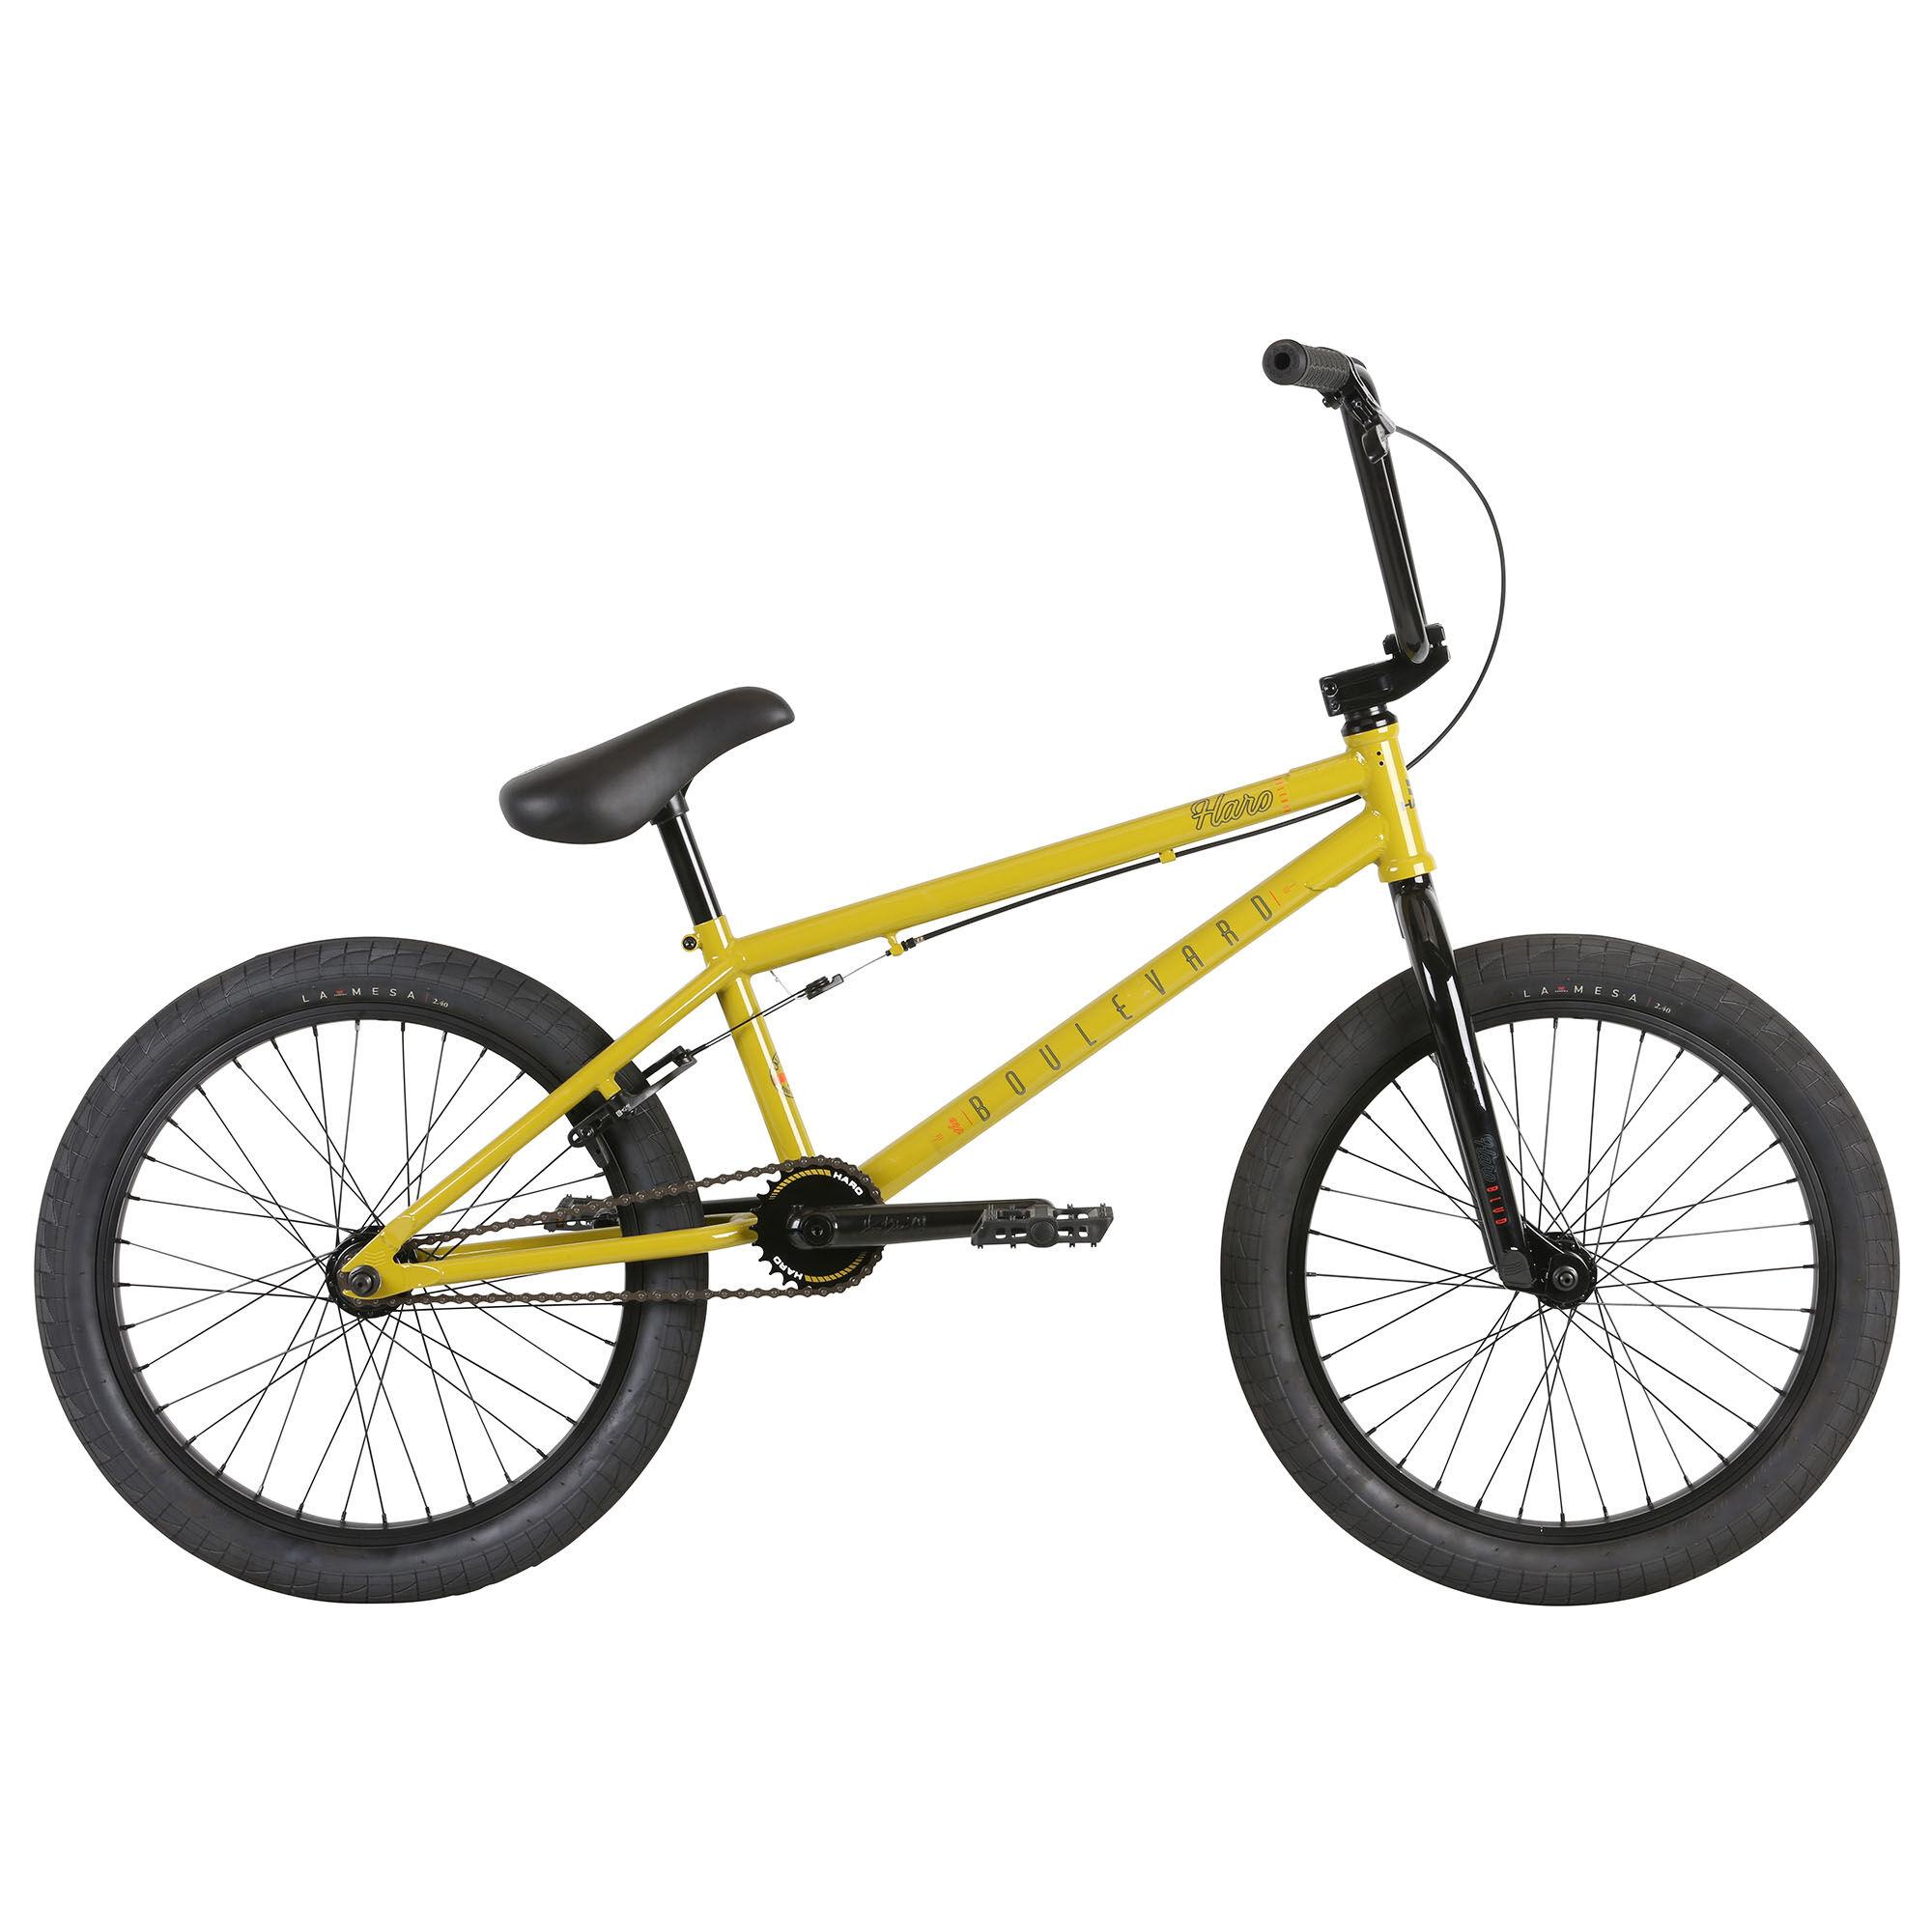 Haro Boulevard 20.75 BMX Bike '21  - Honey Mustard - Size: 20.75